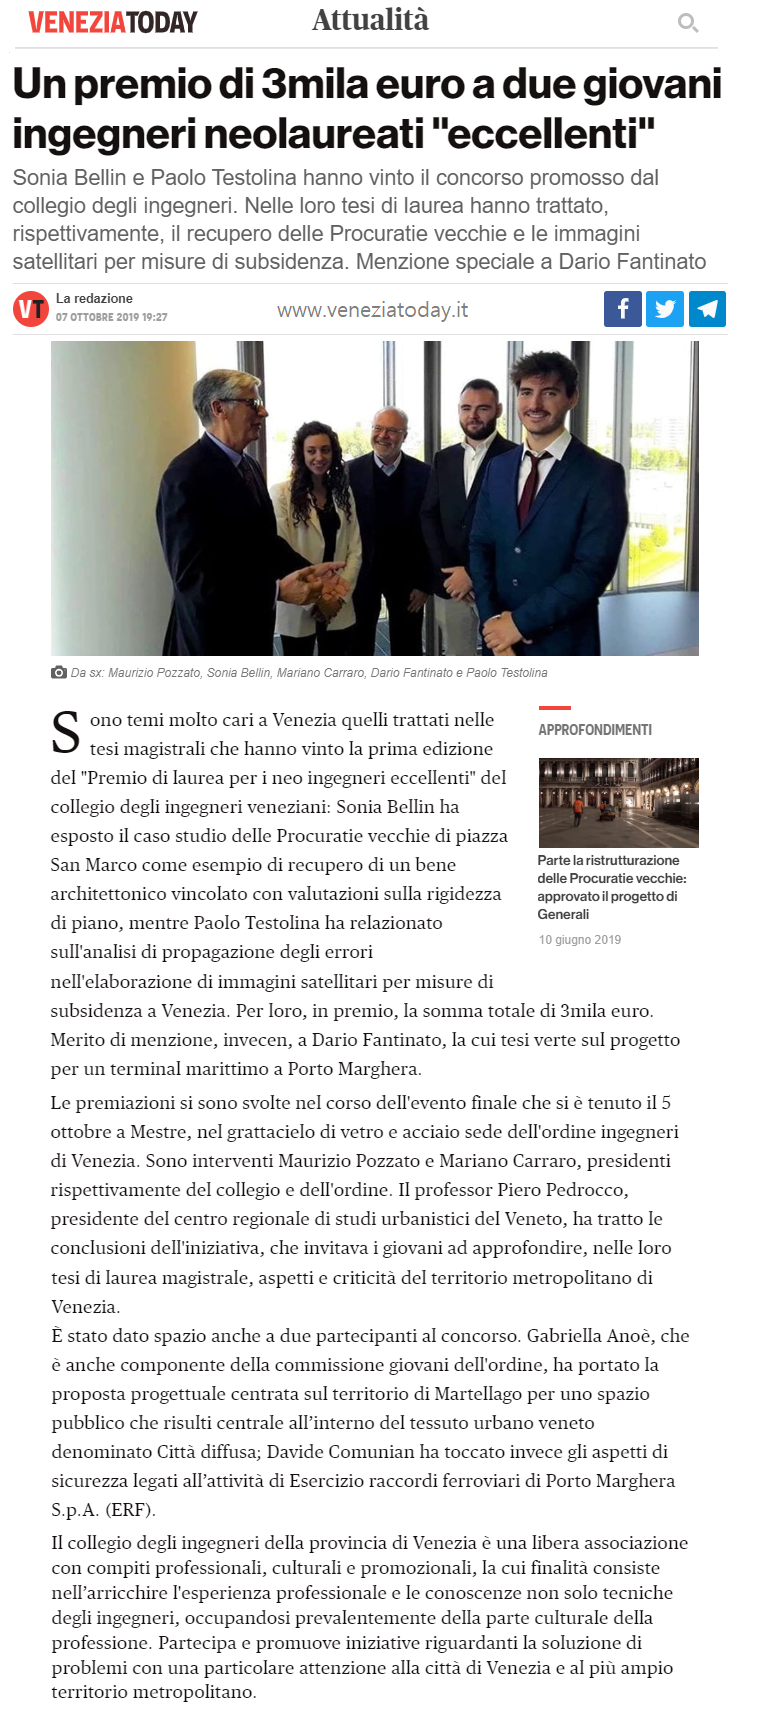 07 07.10.2019 - Venezia Today - Premio di Laurea 2019 Collegio e Ordine Ingegneri Venezia.png